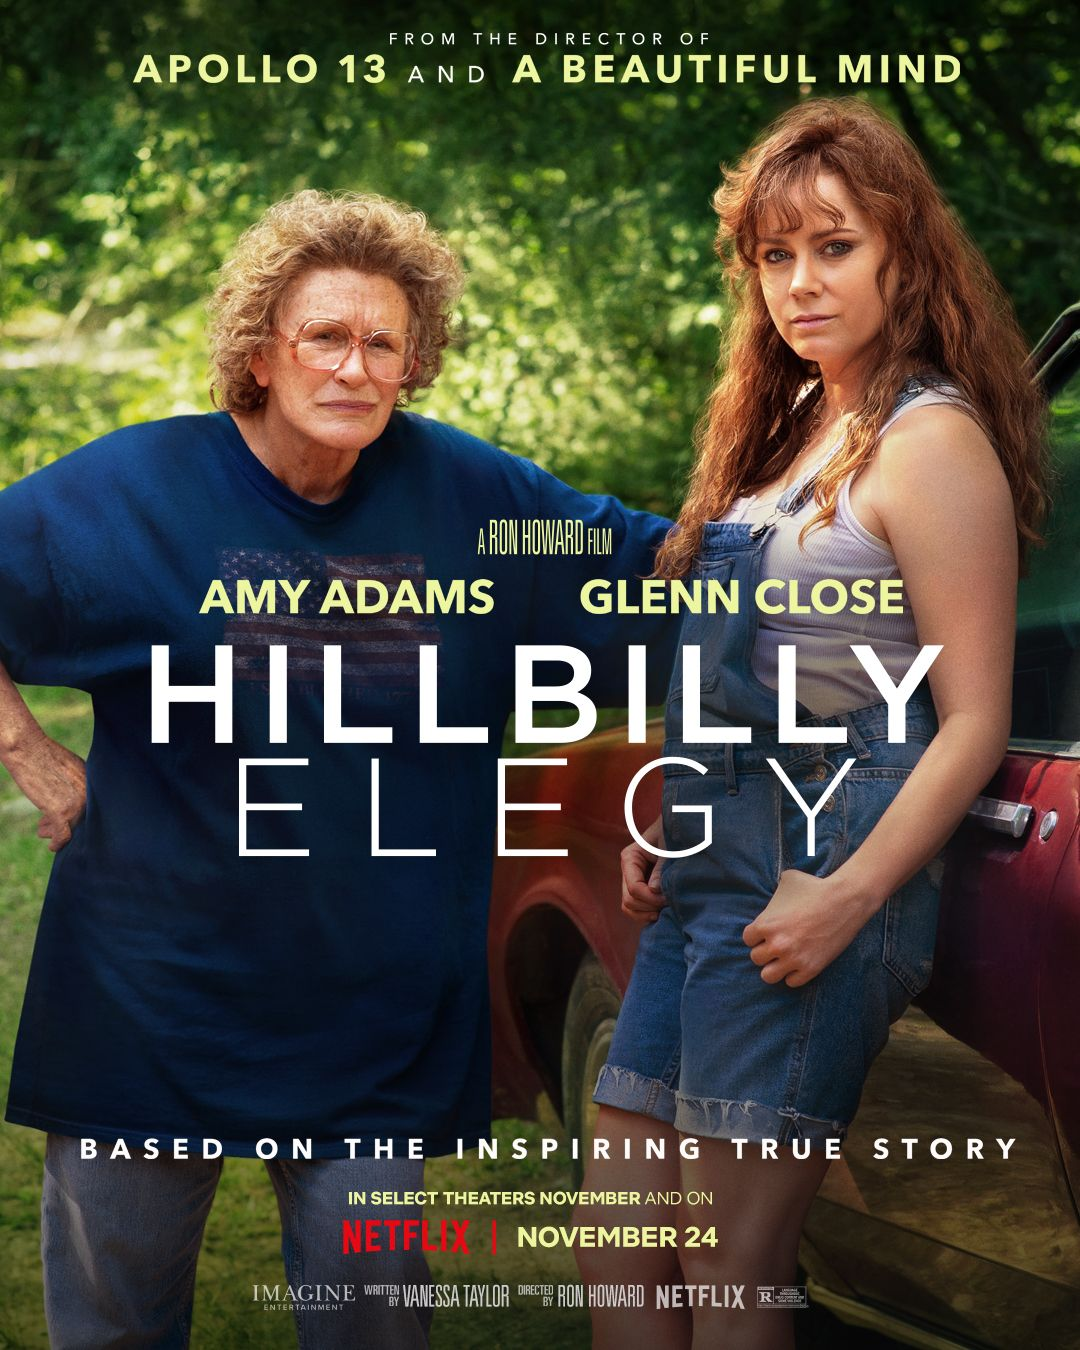 Hillbilly Elegy Netflix Póster Oficial Glenn Close Director De Fotografía Peliculas